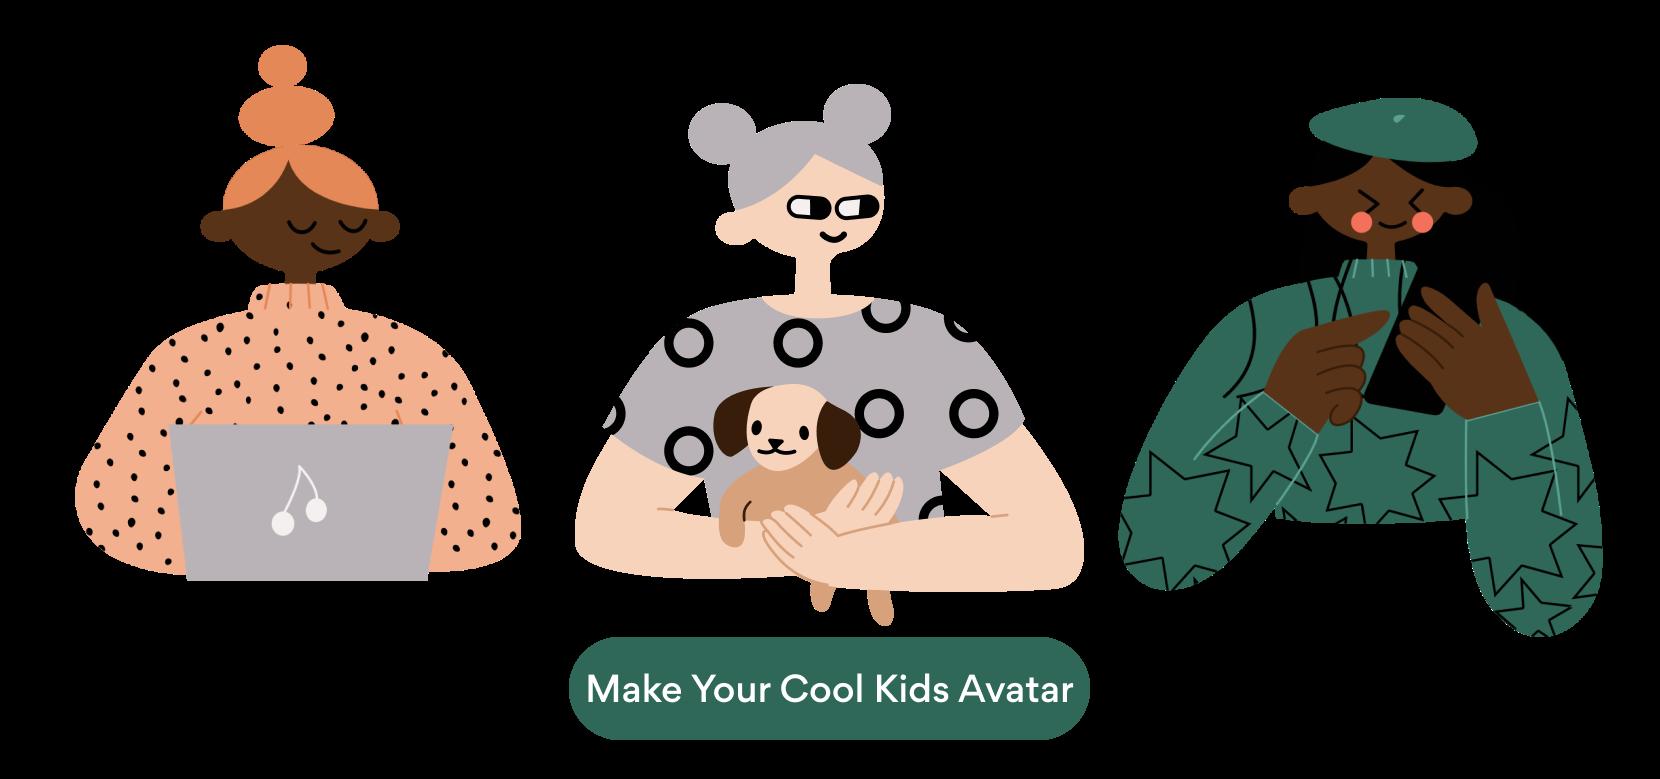 Avatars with cool kids illustrations